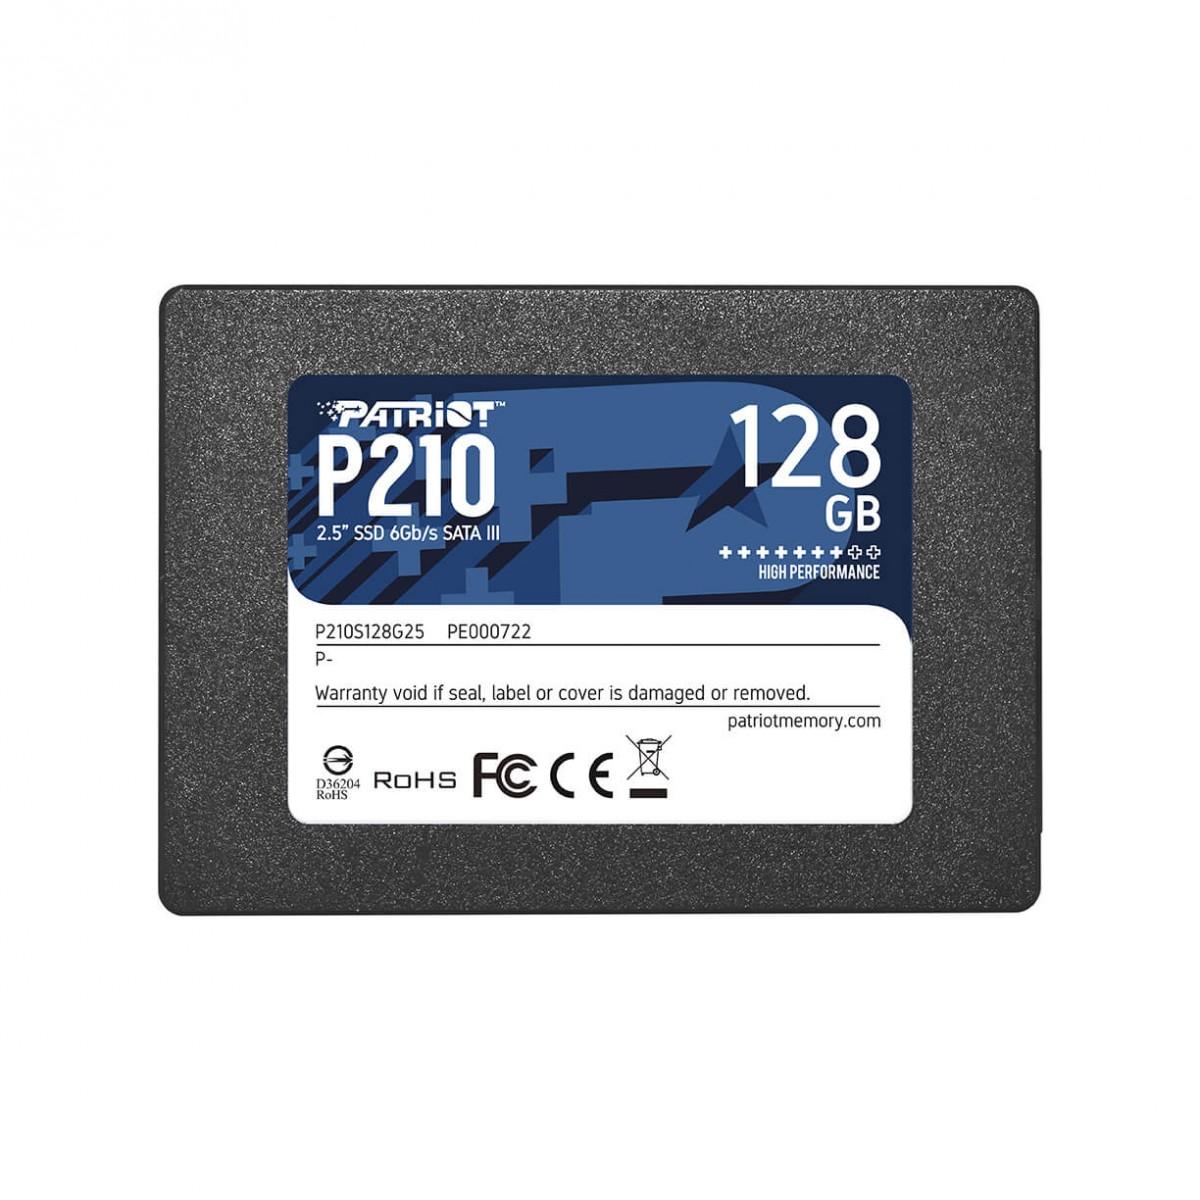 "HD SSD 128GB PATRIOT P210 SATA 3 2.5"" - P210S128G25"